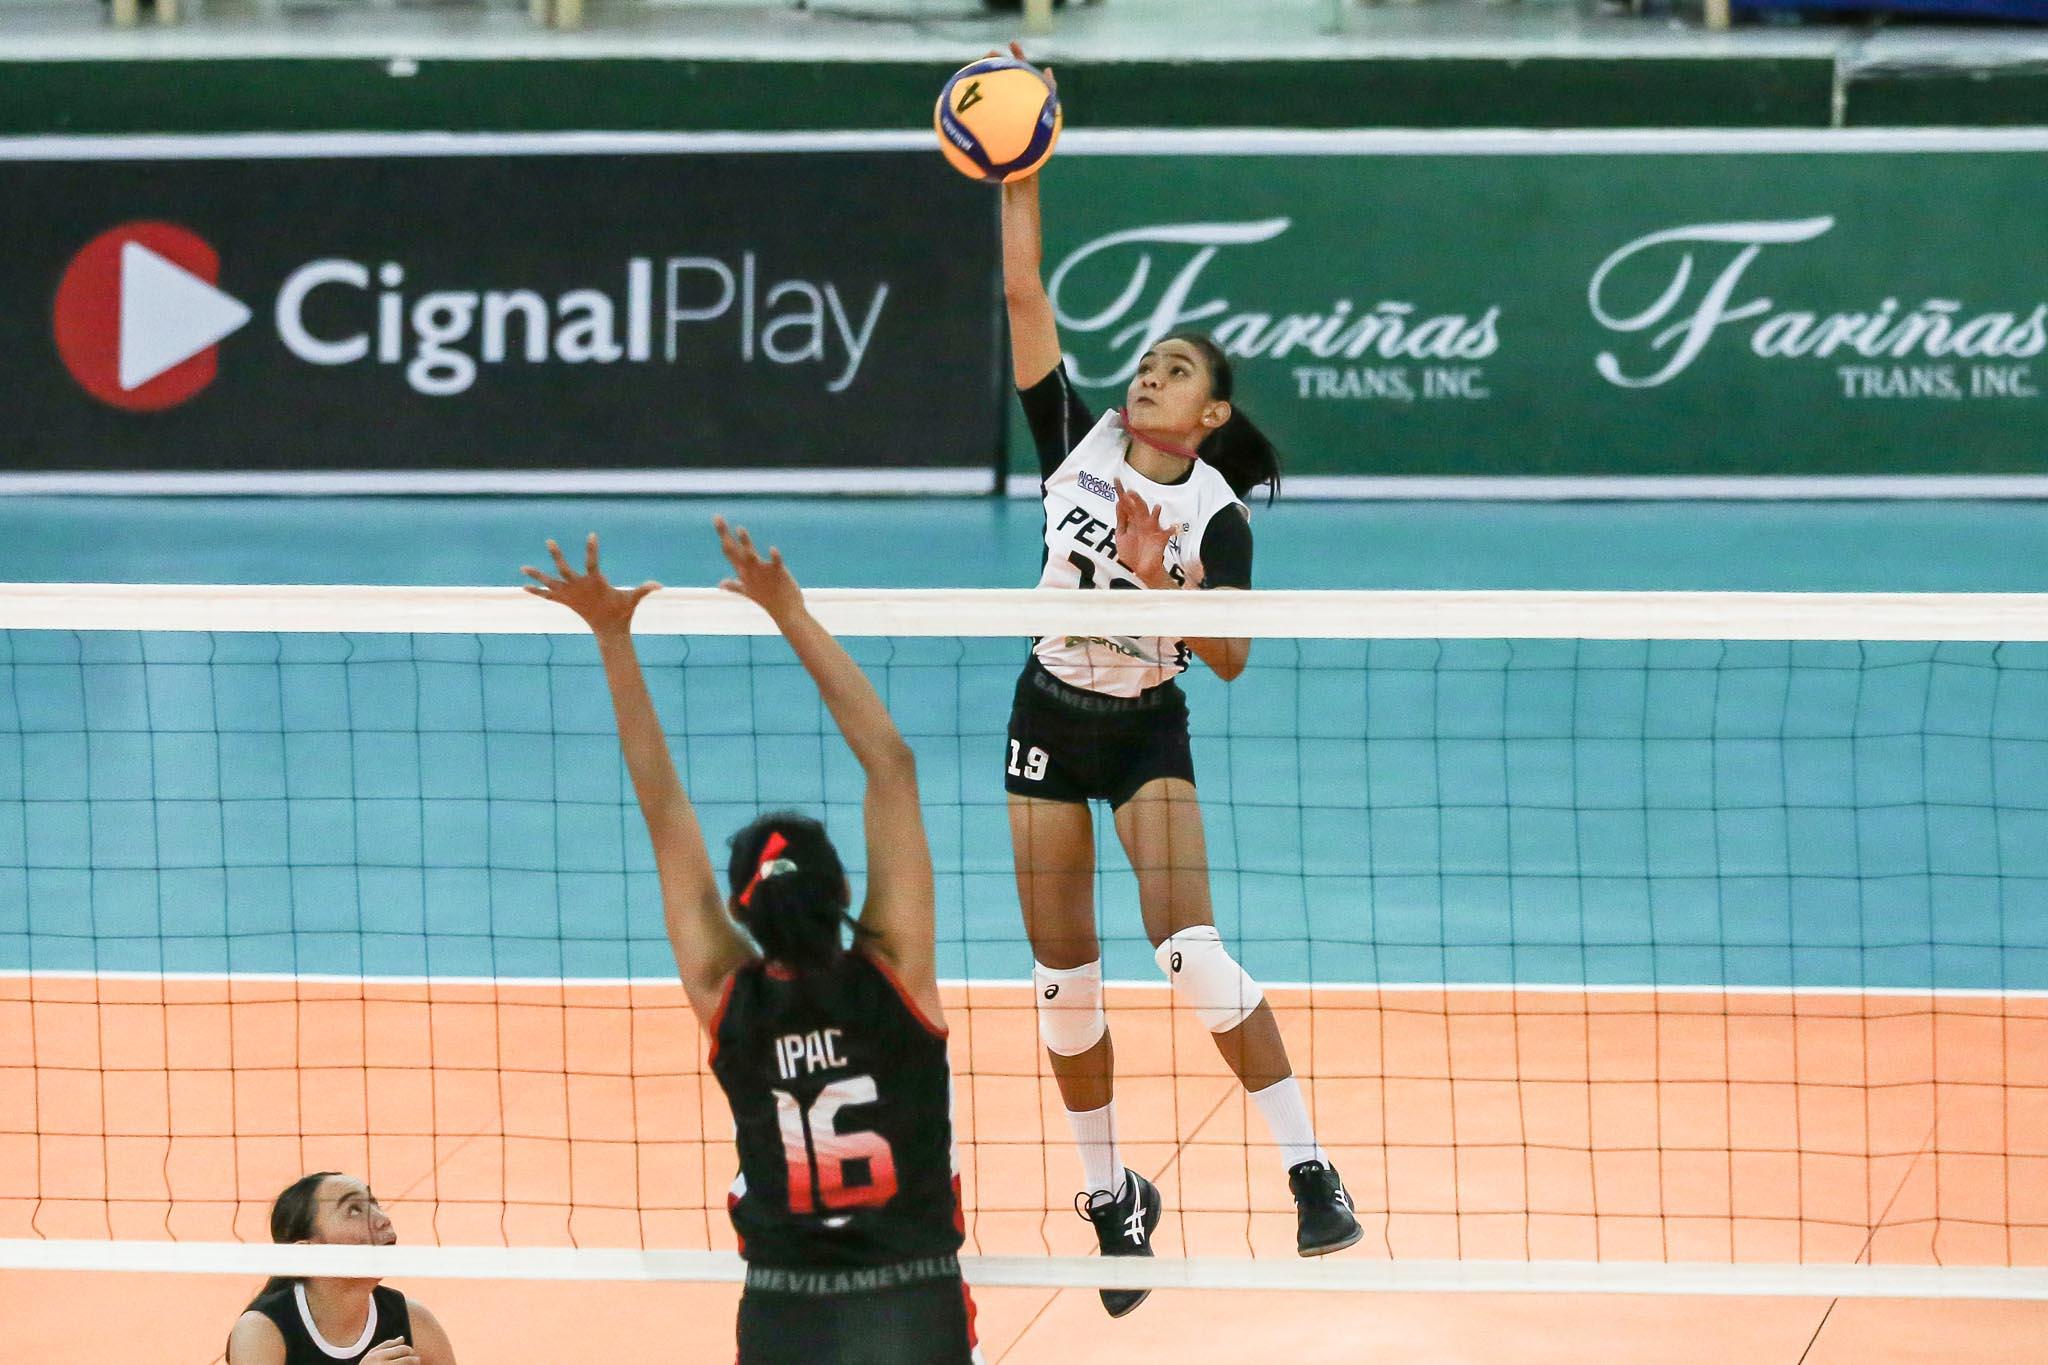 2021-PVL-Open-Cignal-vs-Perlas-Nicole-Tiamzon-1 Sacrifices all worth it for Perlas after breakthrough win, says Tiamzon News PVL Volleyball  - philippine sports news